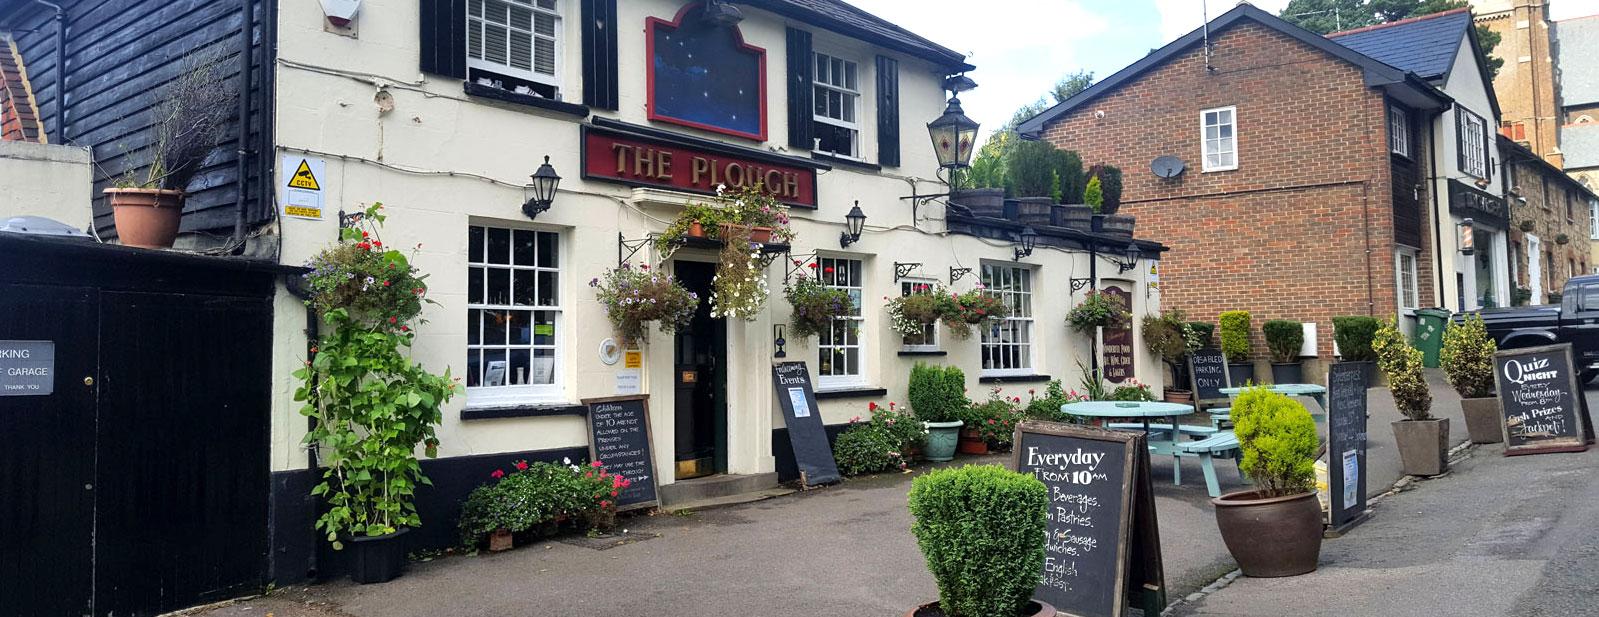 Plough Pub, St. Johns, Redhill, Surrey